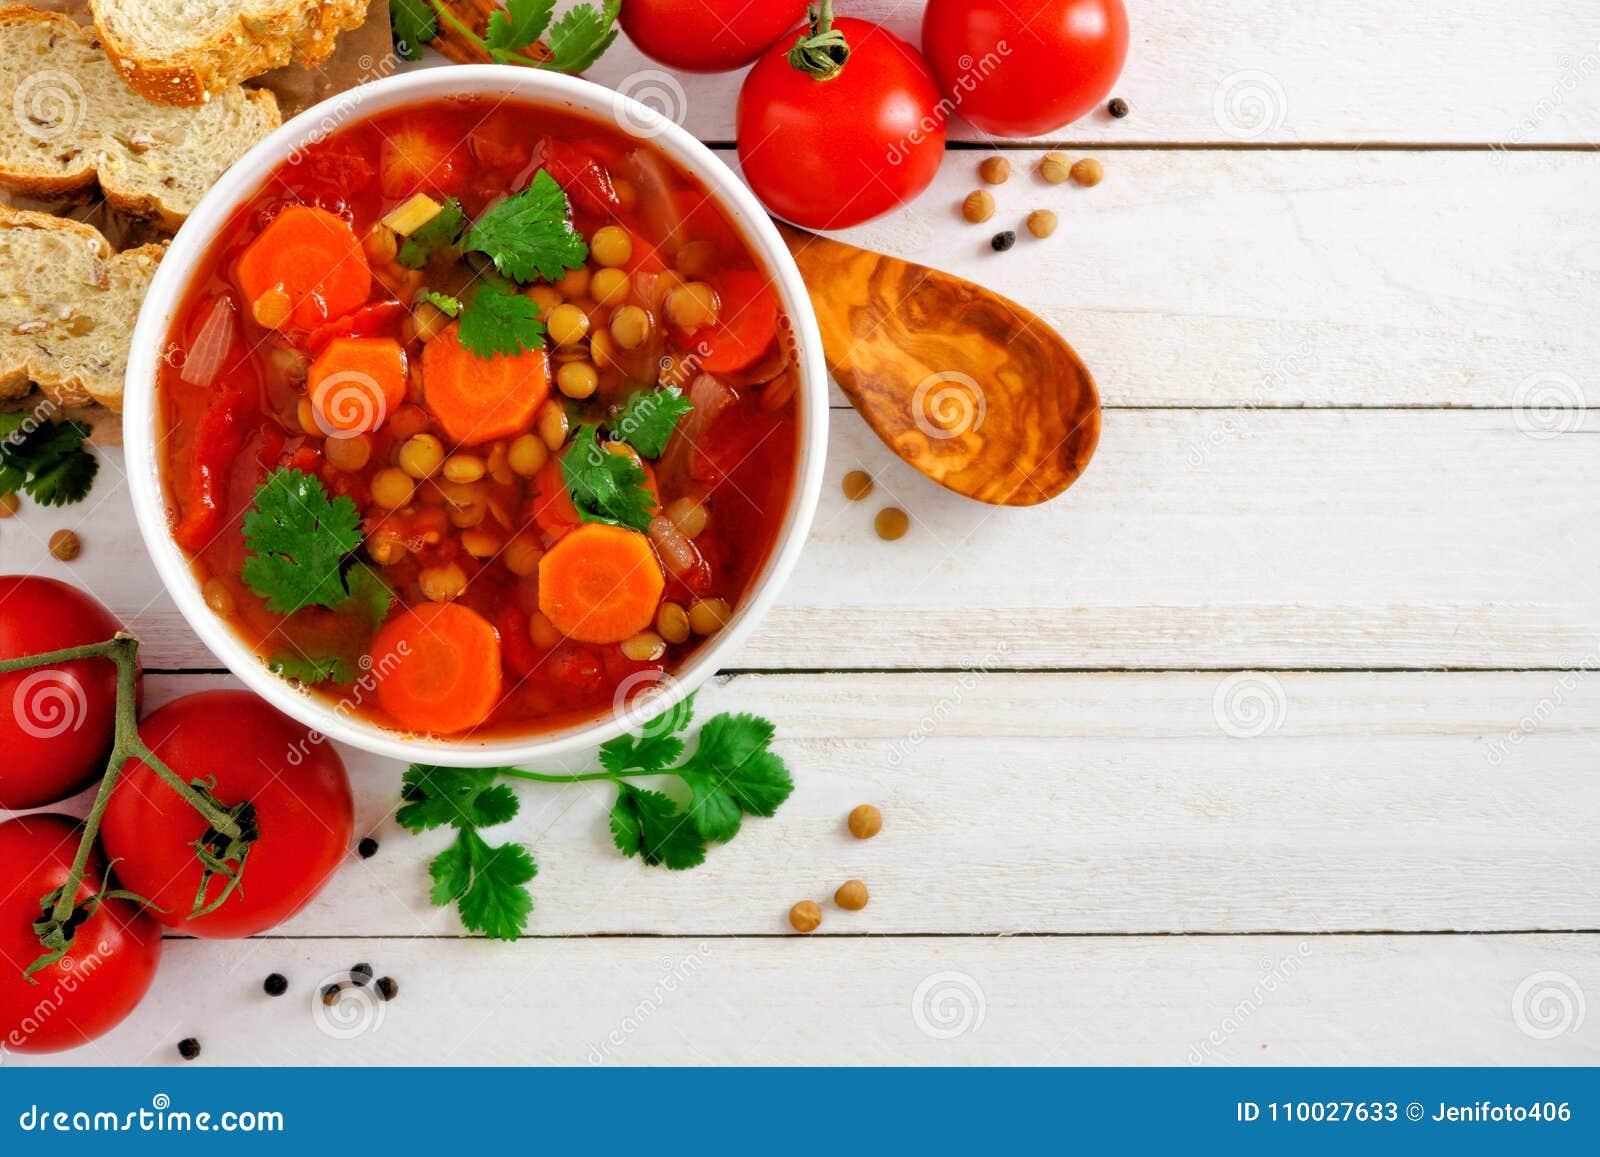 Eigengemaakte tomaat, linzesoep, hierboven, hoekgrens op wit hout